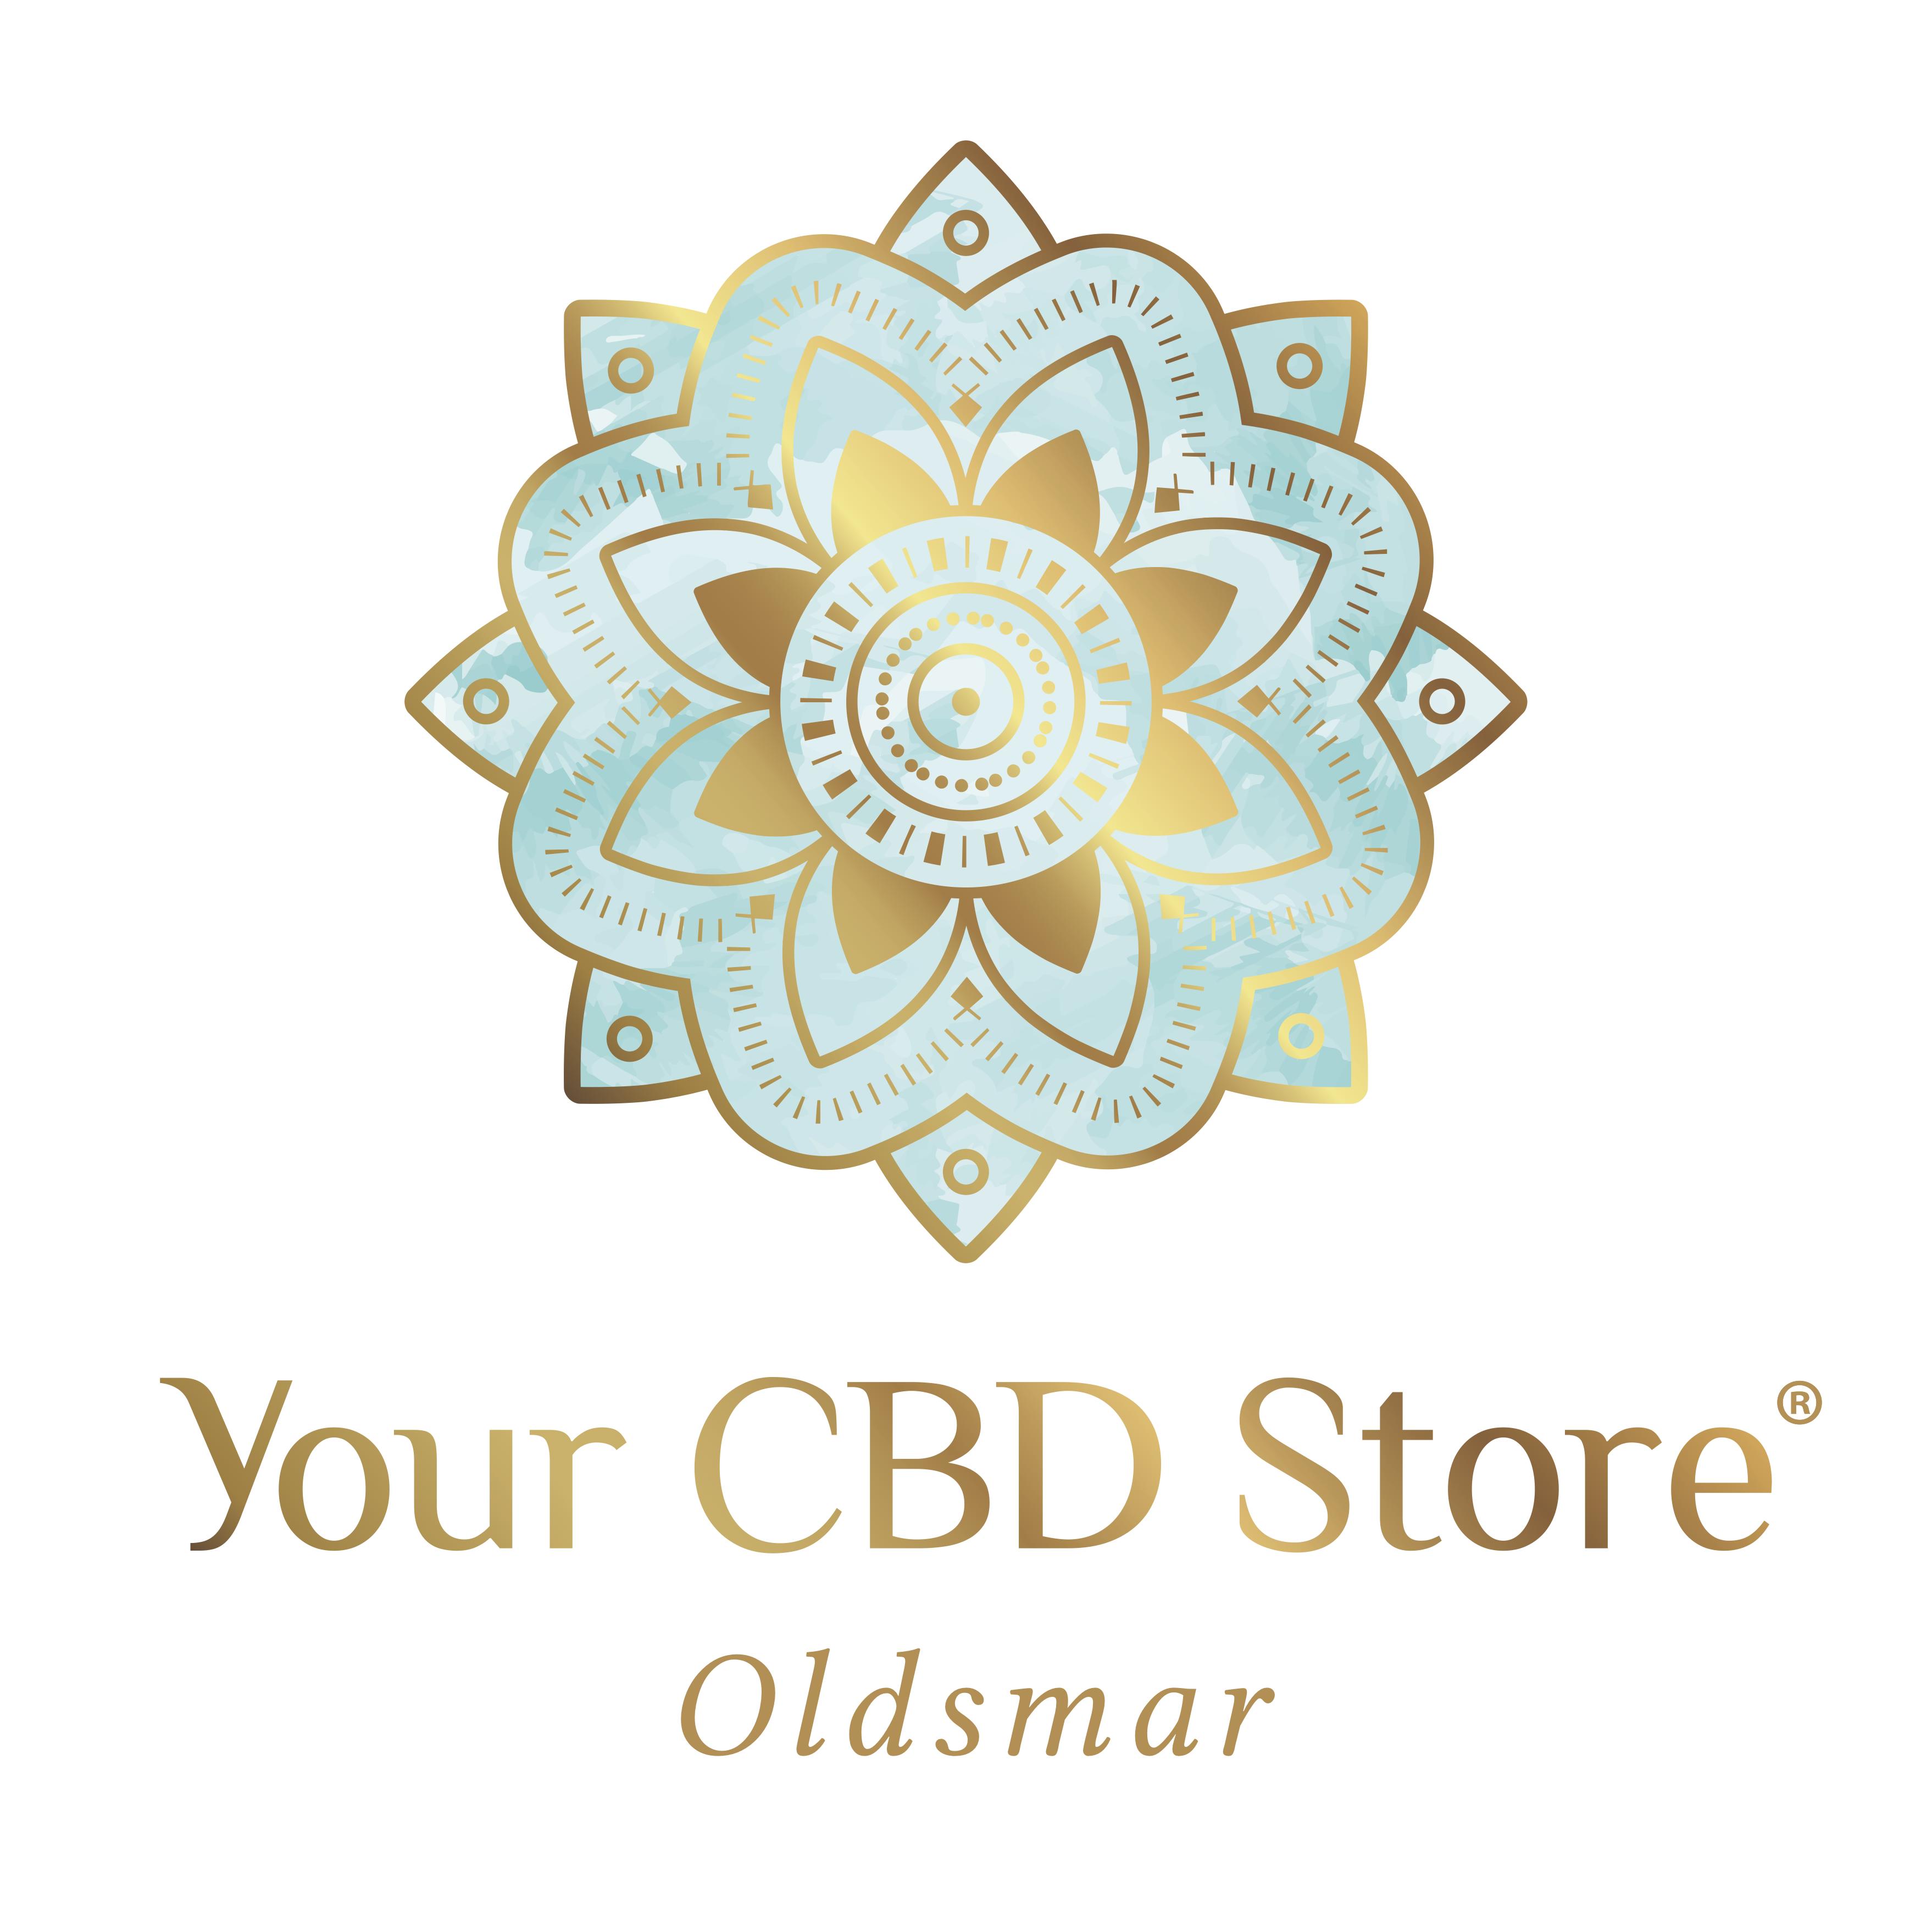 Your CBD Store - Oldsmar FL